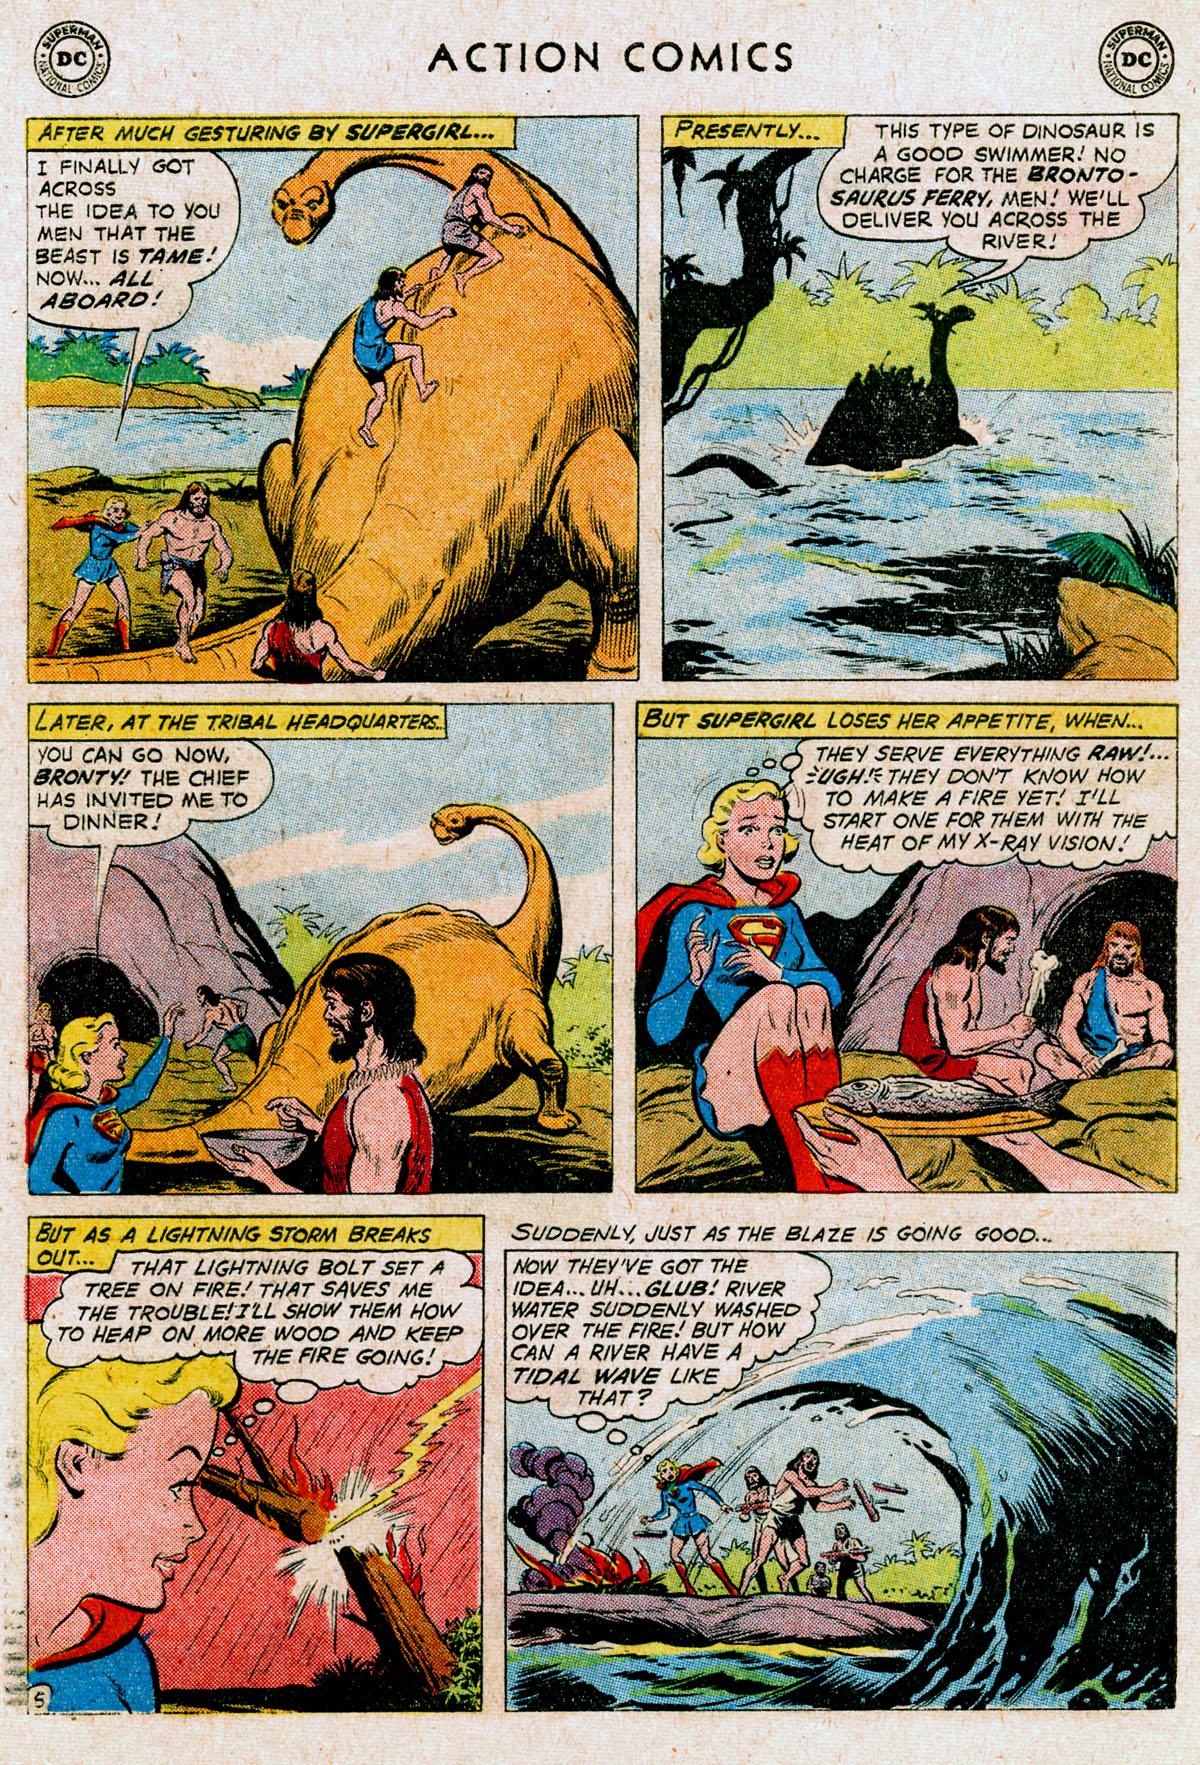 Action Comics (1938) 259 Page 29